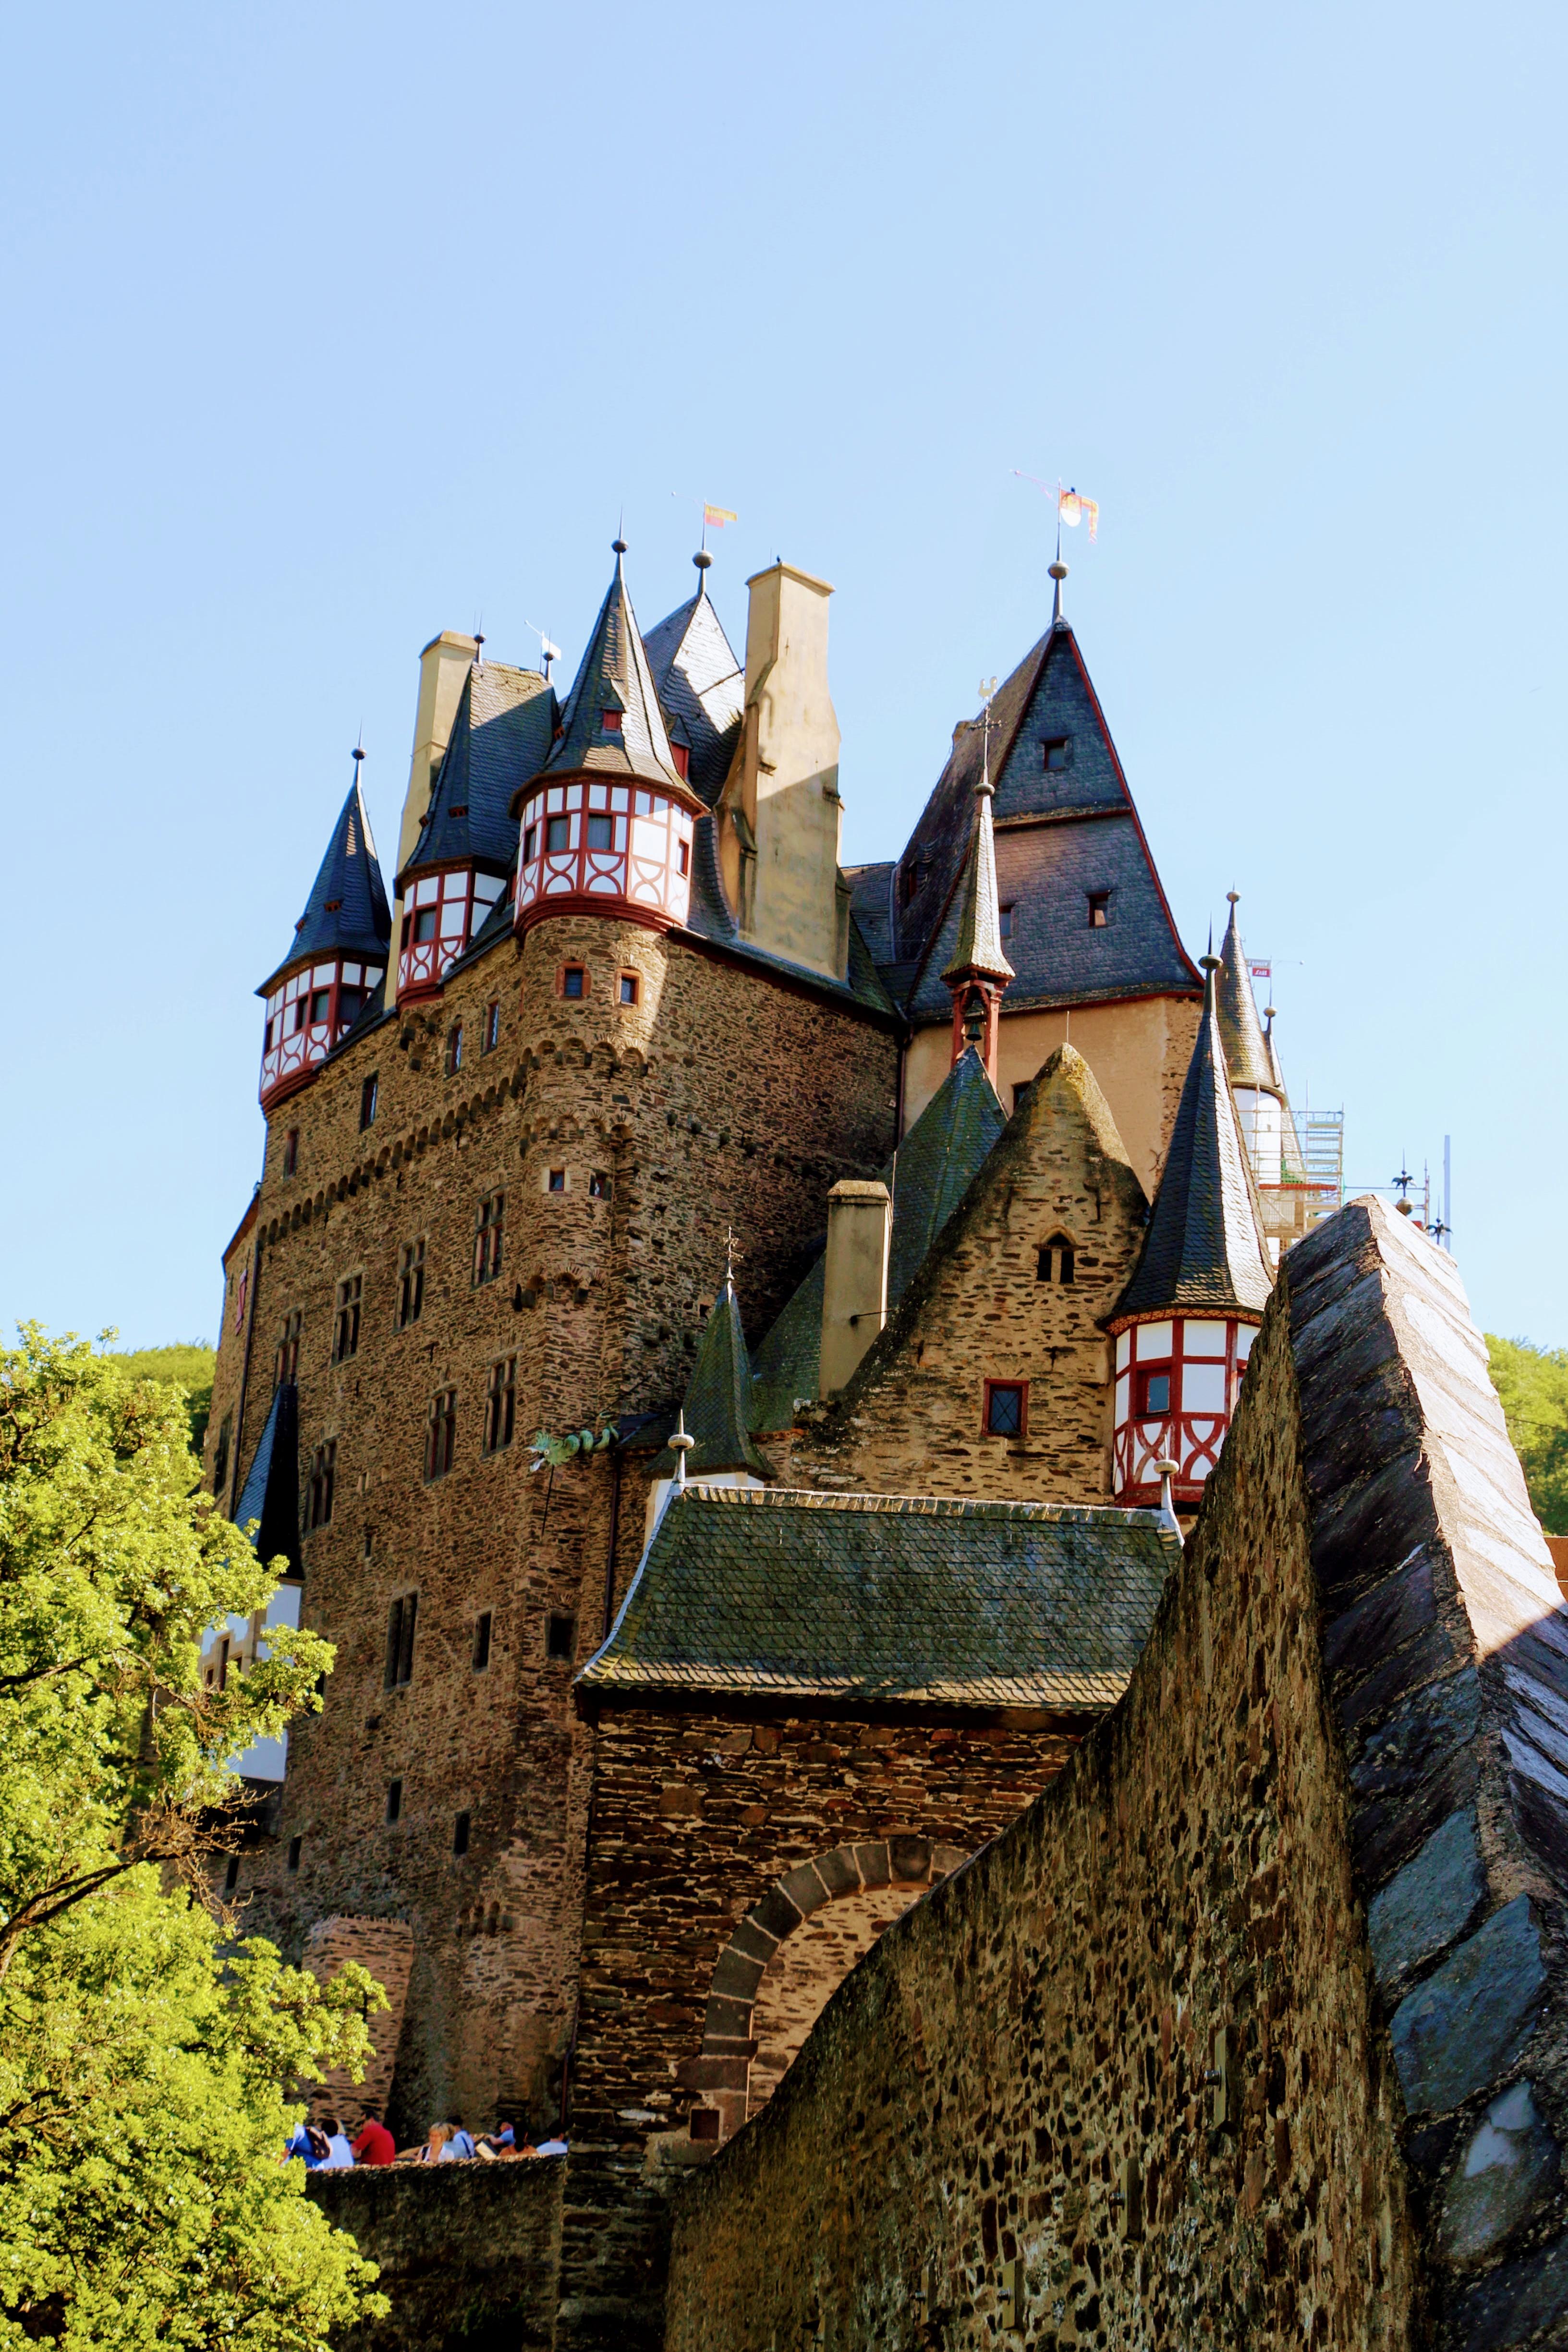 Moezel Duitsland mooiste kasteel